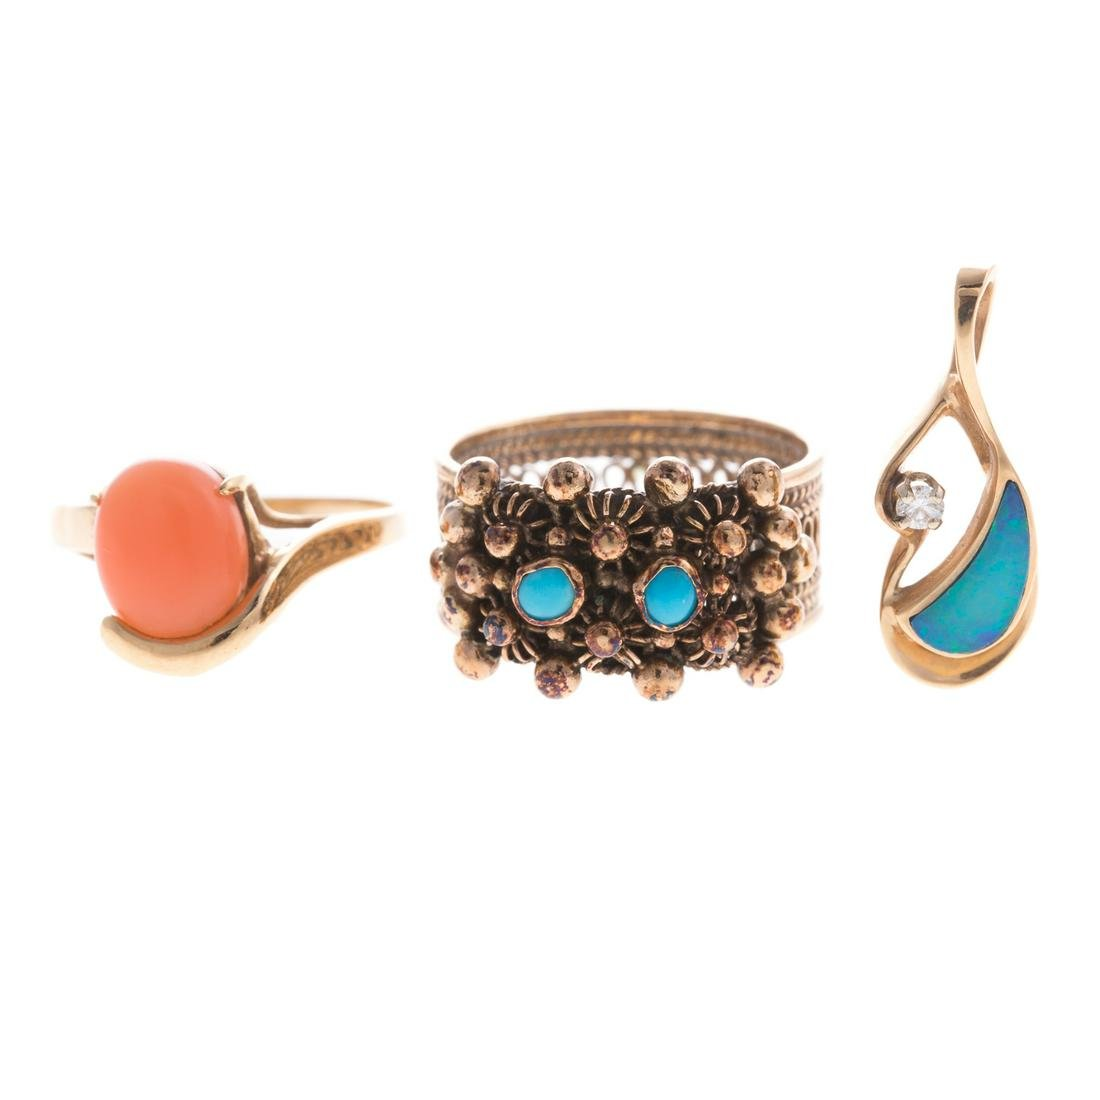 An Assortment of Gold Gemstone Jewelry